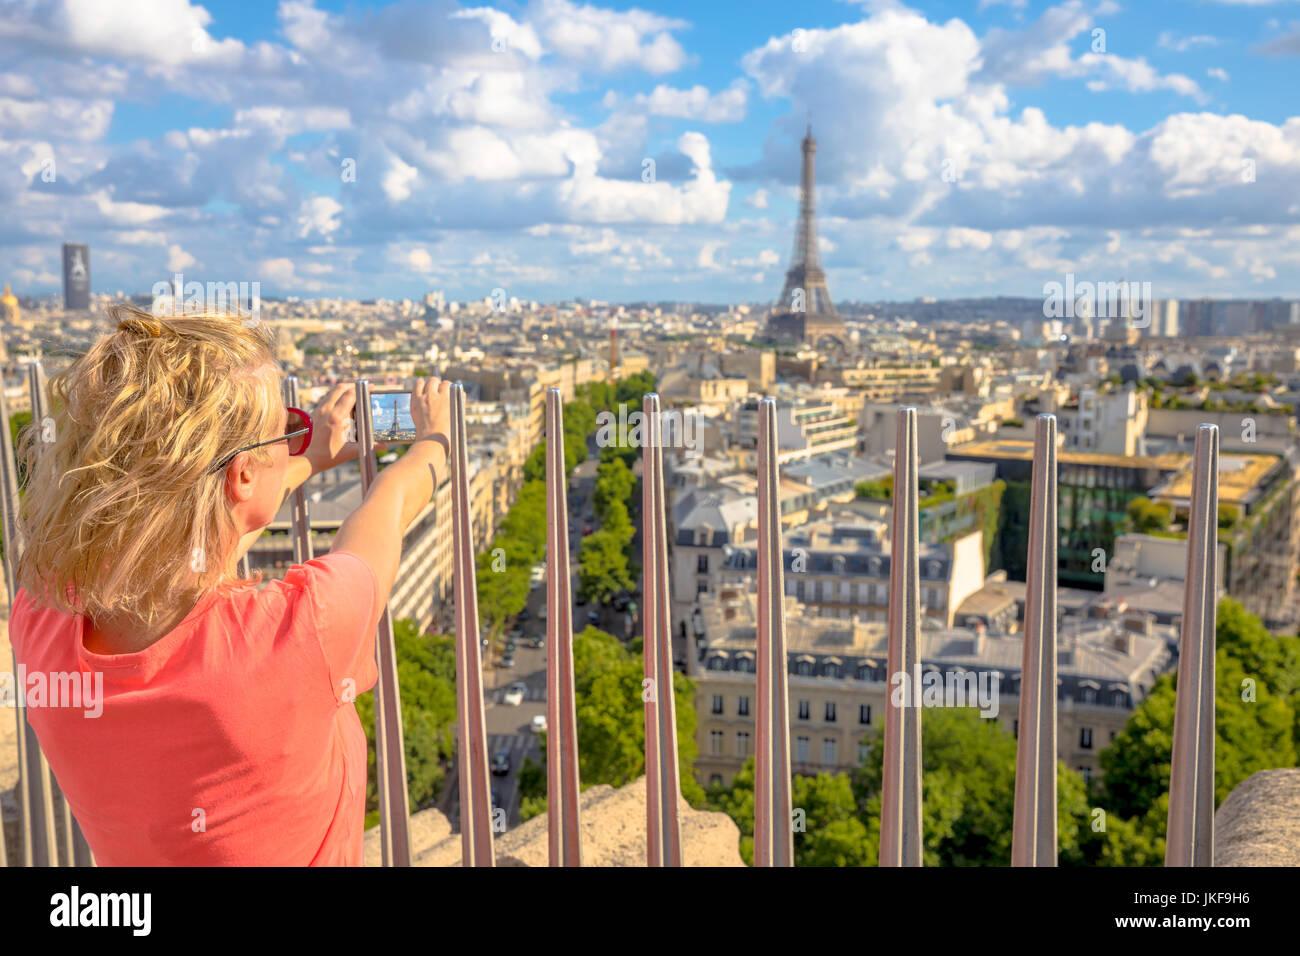 Woman photographs Eiffel Tower Stock Photo